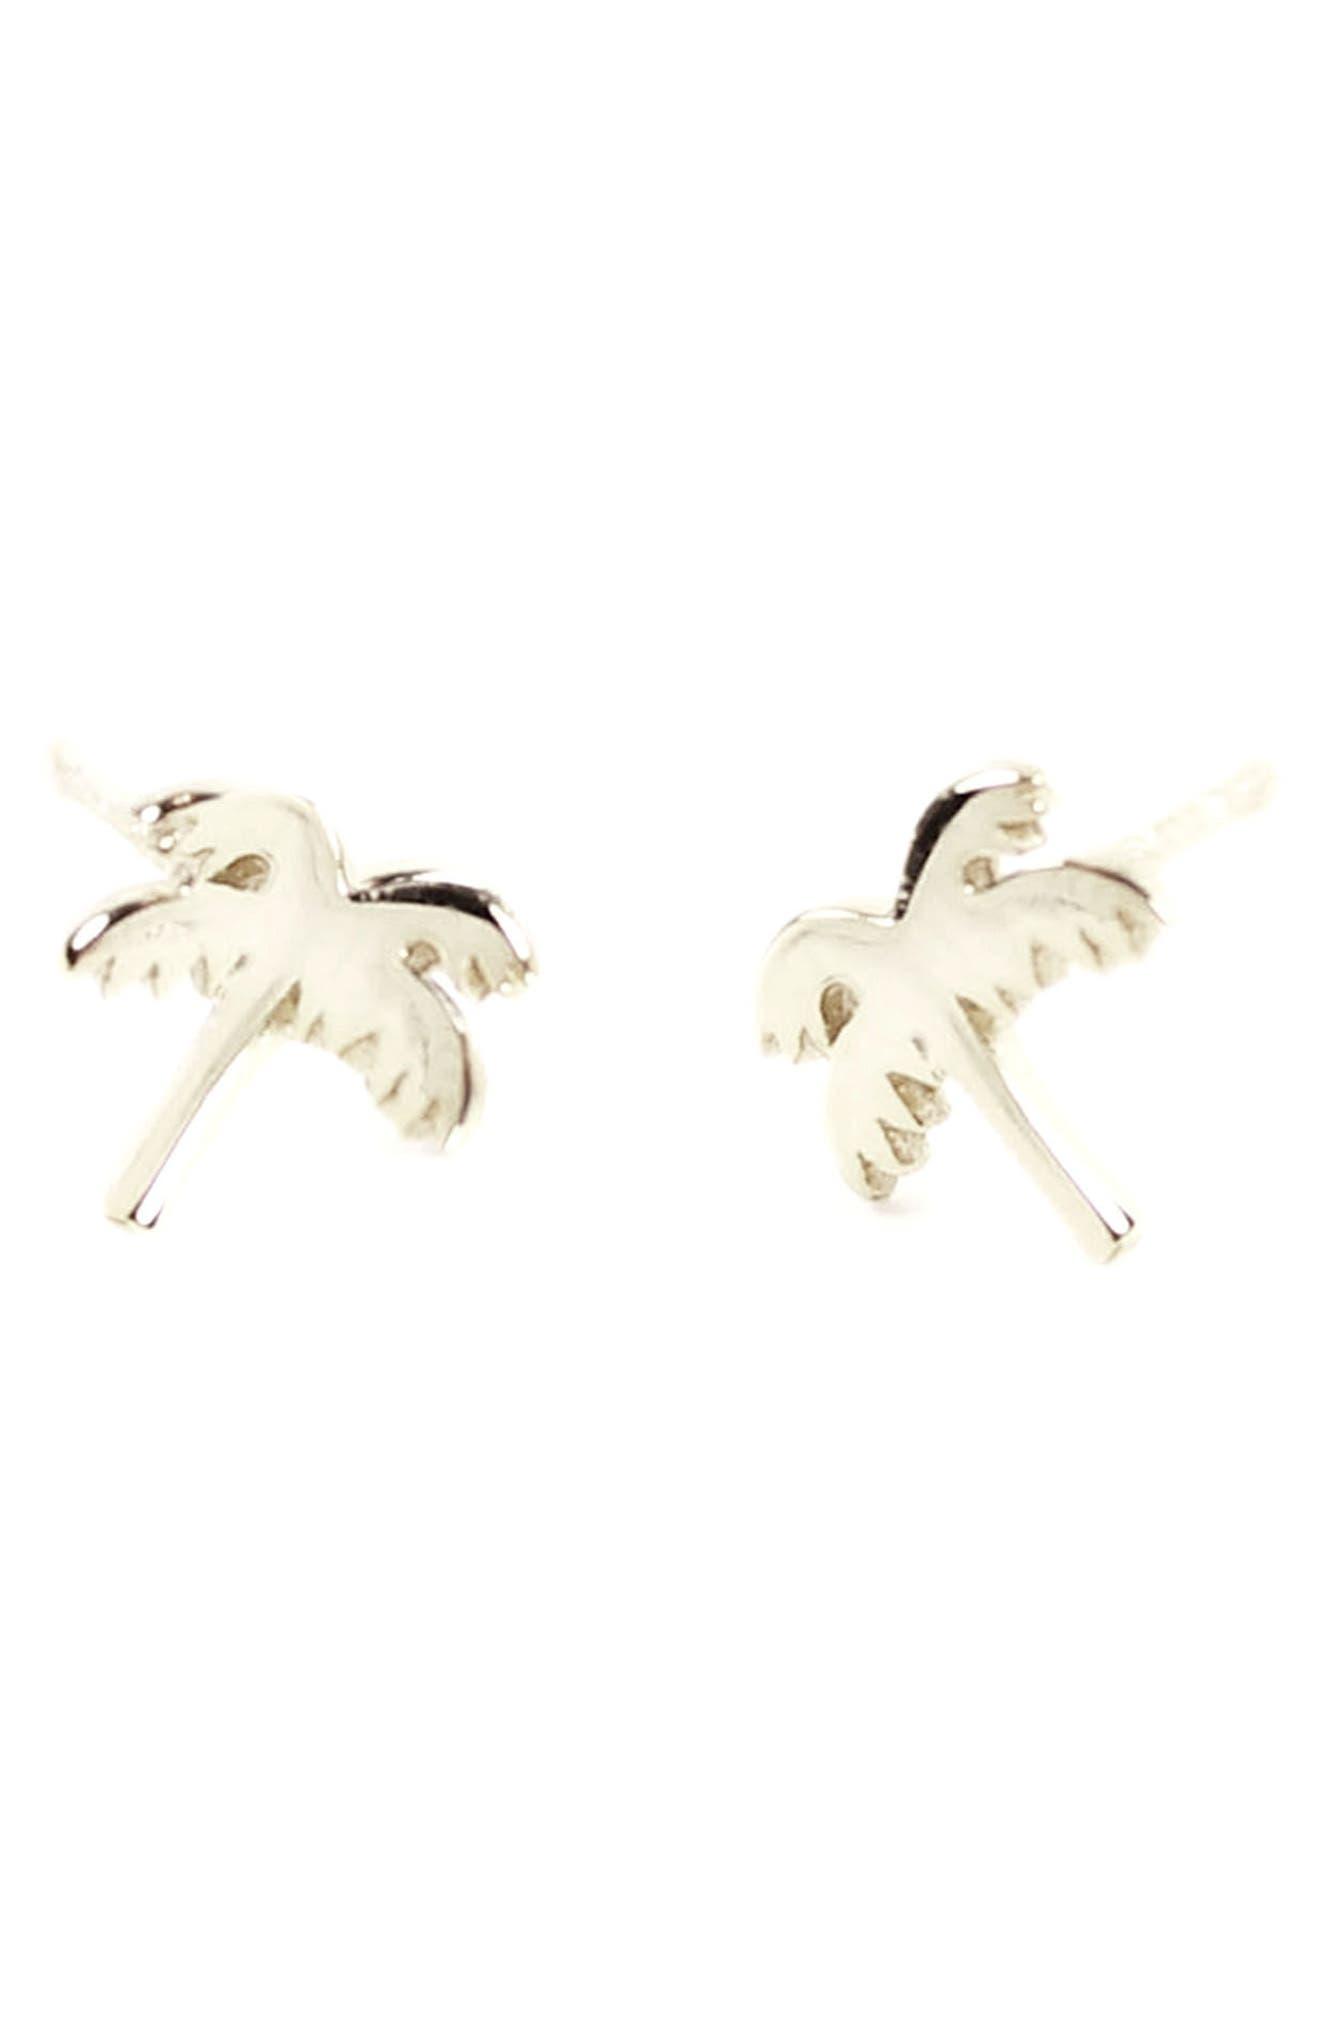 Palm Tree Stud Earrings,                             Main thumbnail 1, color,                             SILVER